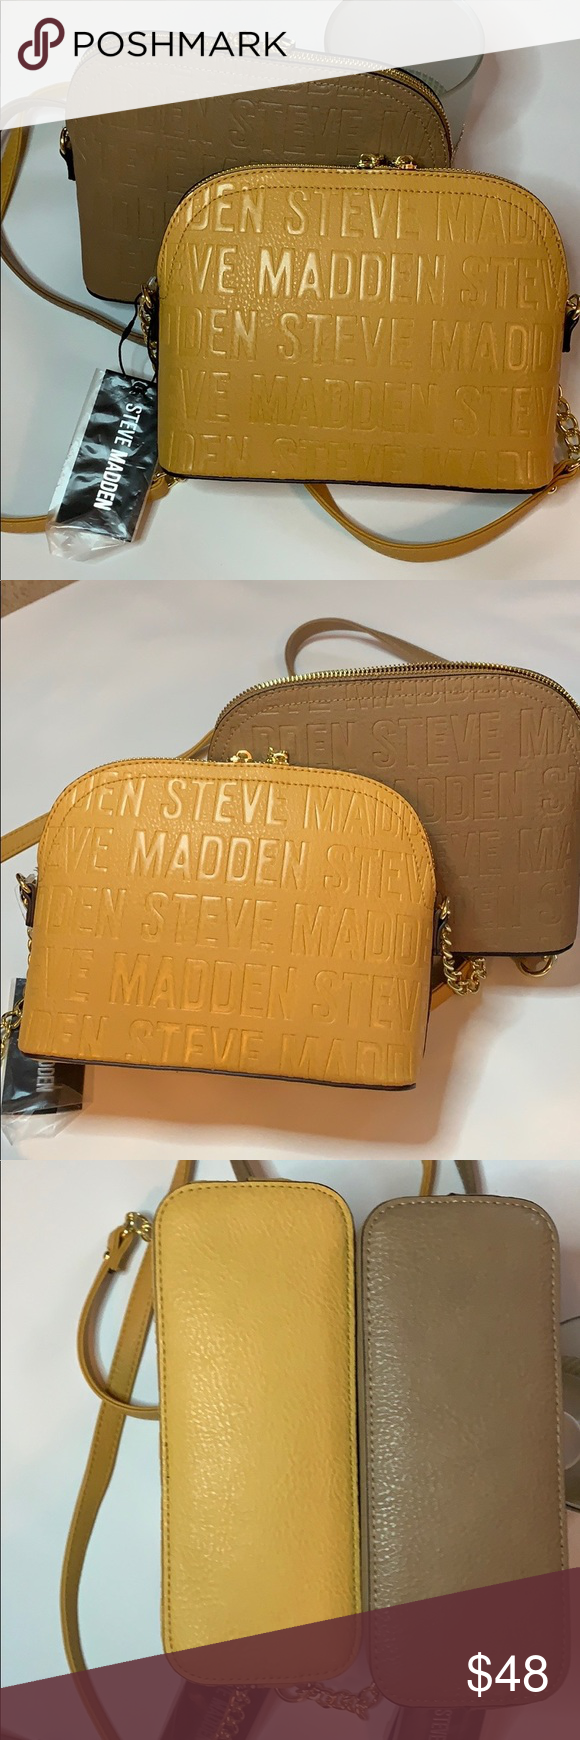 STEVE MADDEN HANDBAG BMAGGIE BLACK MULTICOLOR GOLD TONE HARDWARE NEW